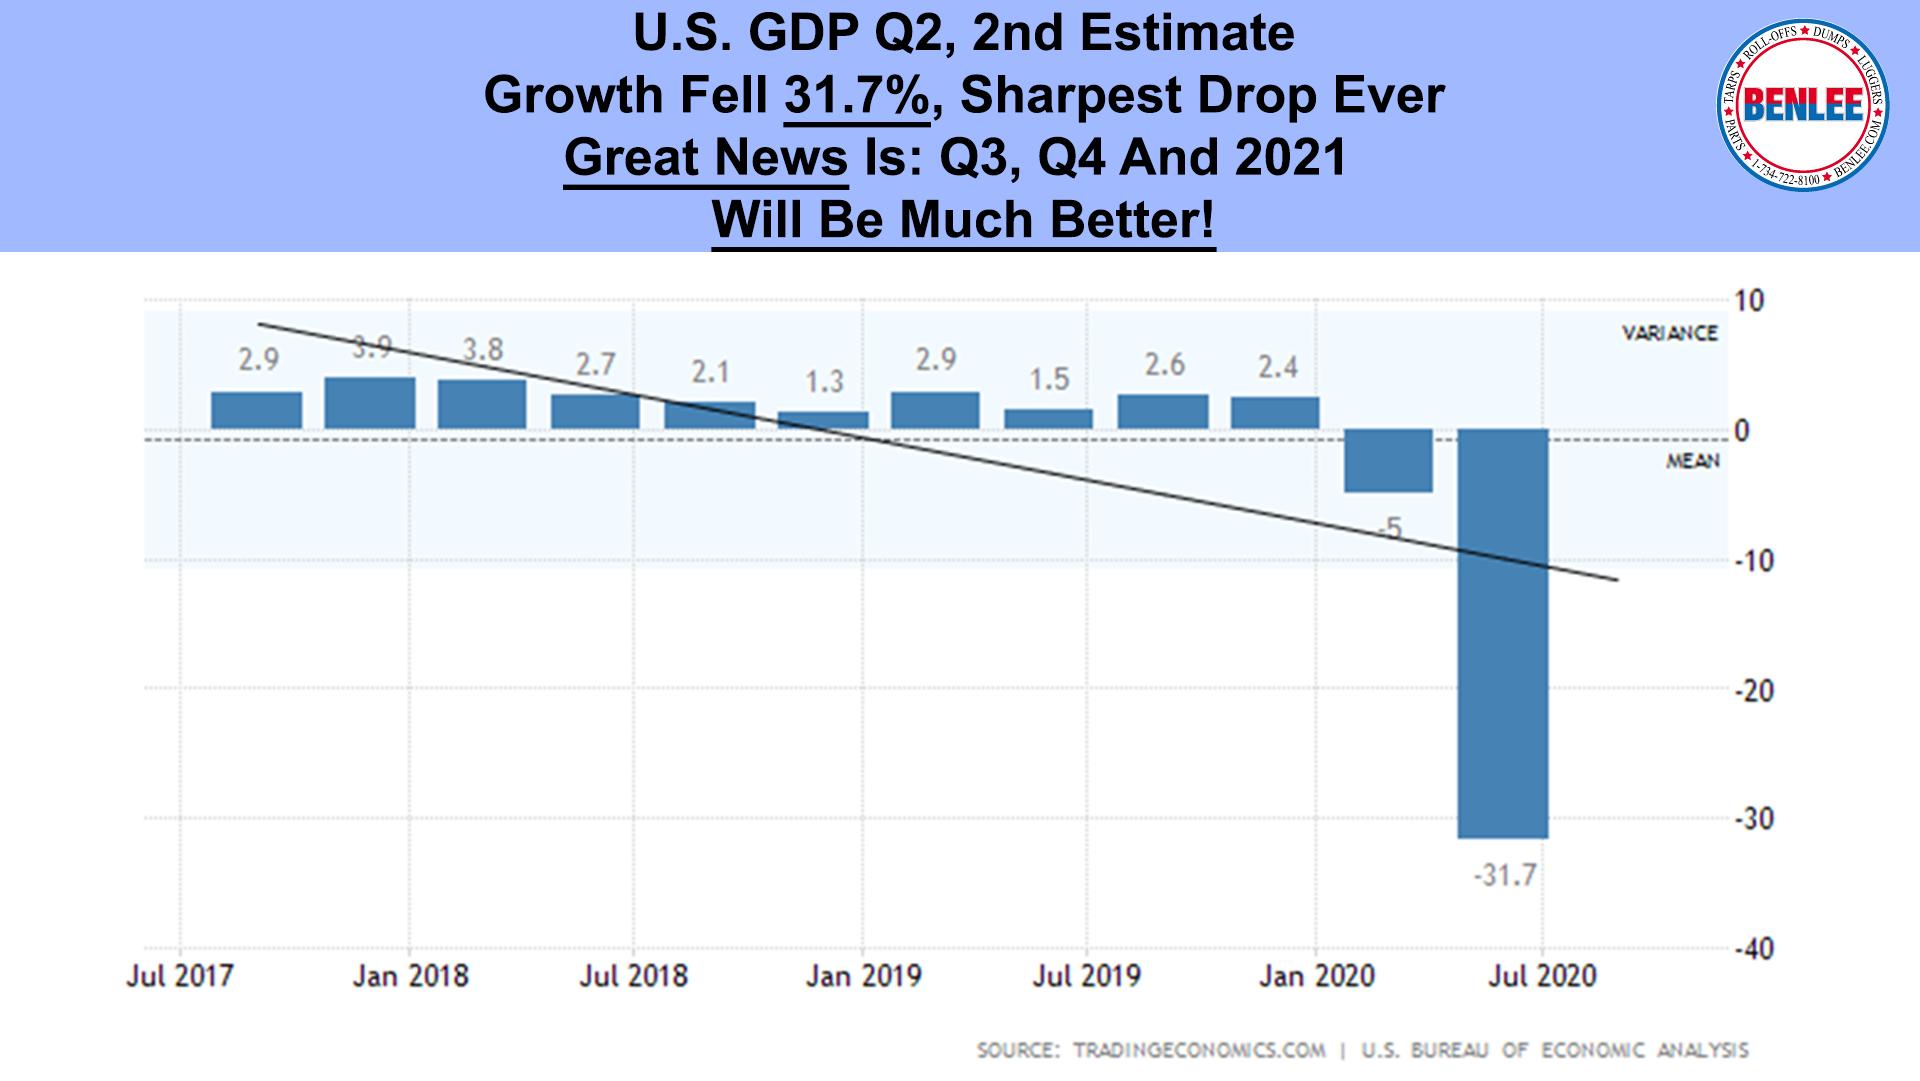 U.S. GDP Q2, 2nd Estimate